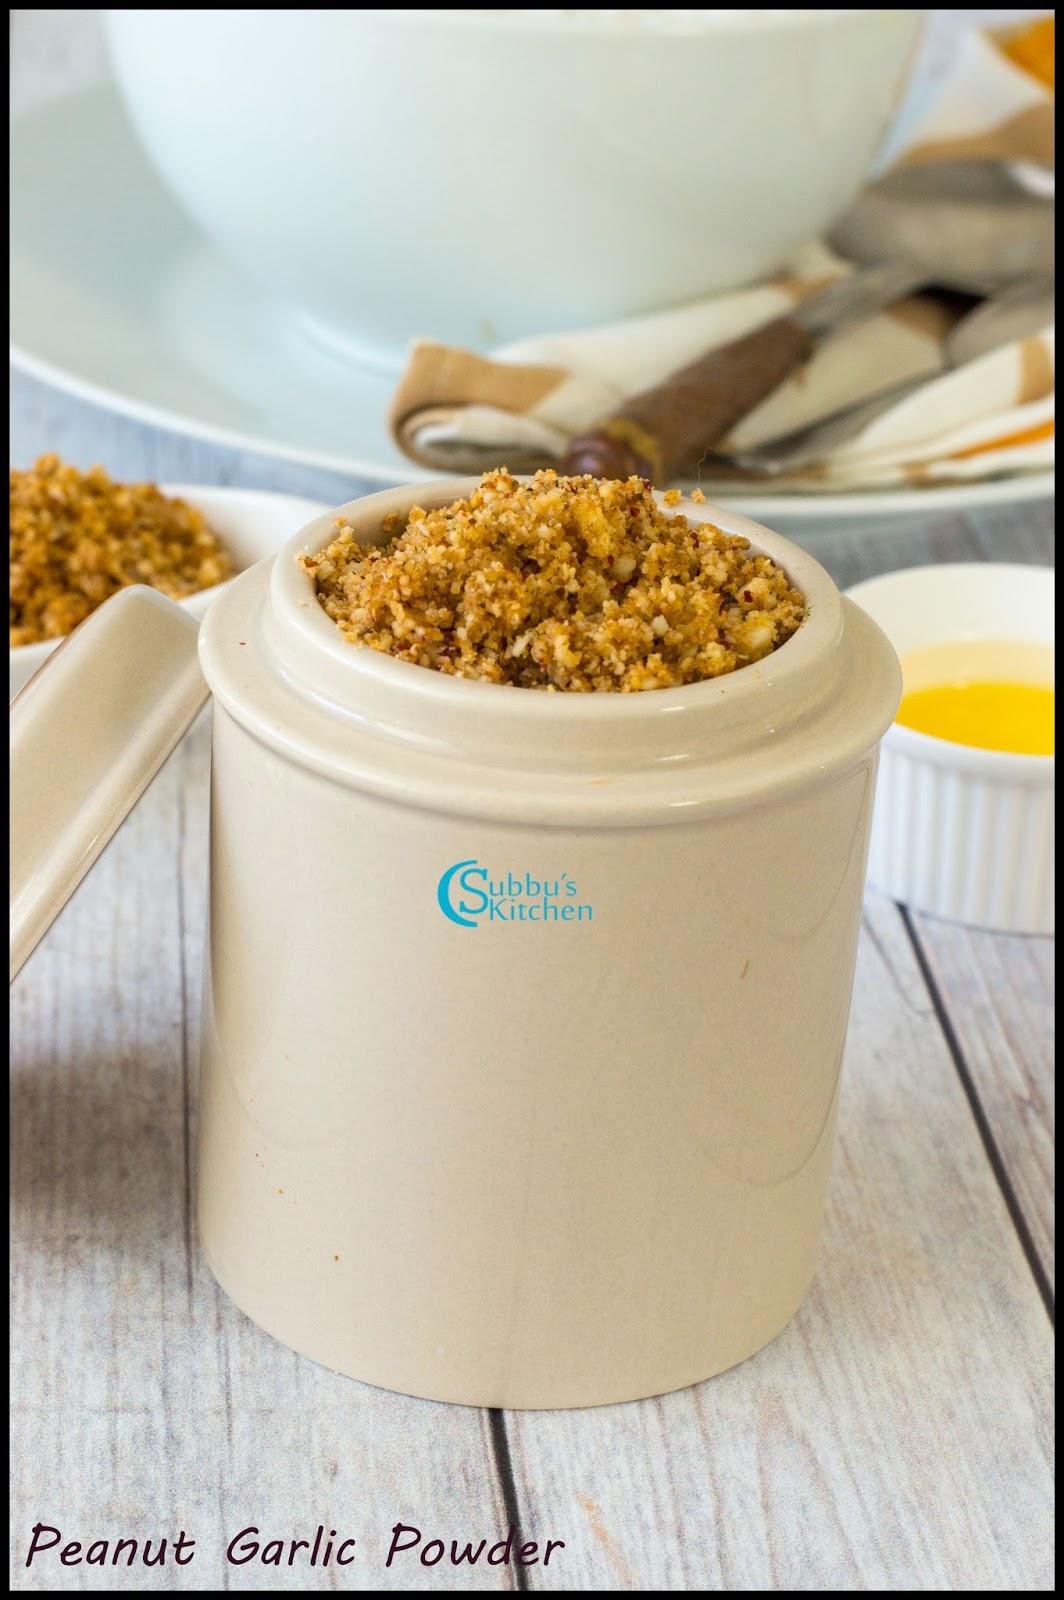 Peanut Garlic Podi Recipe | Spicy Peanut with Garlic Powder | Subbus ...